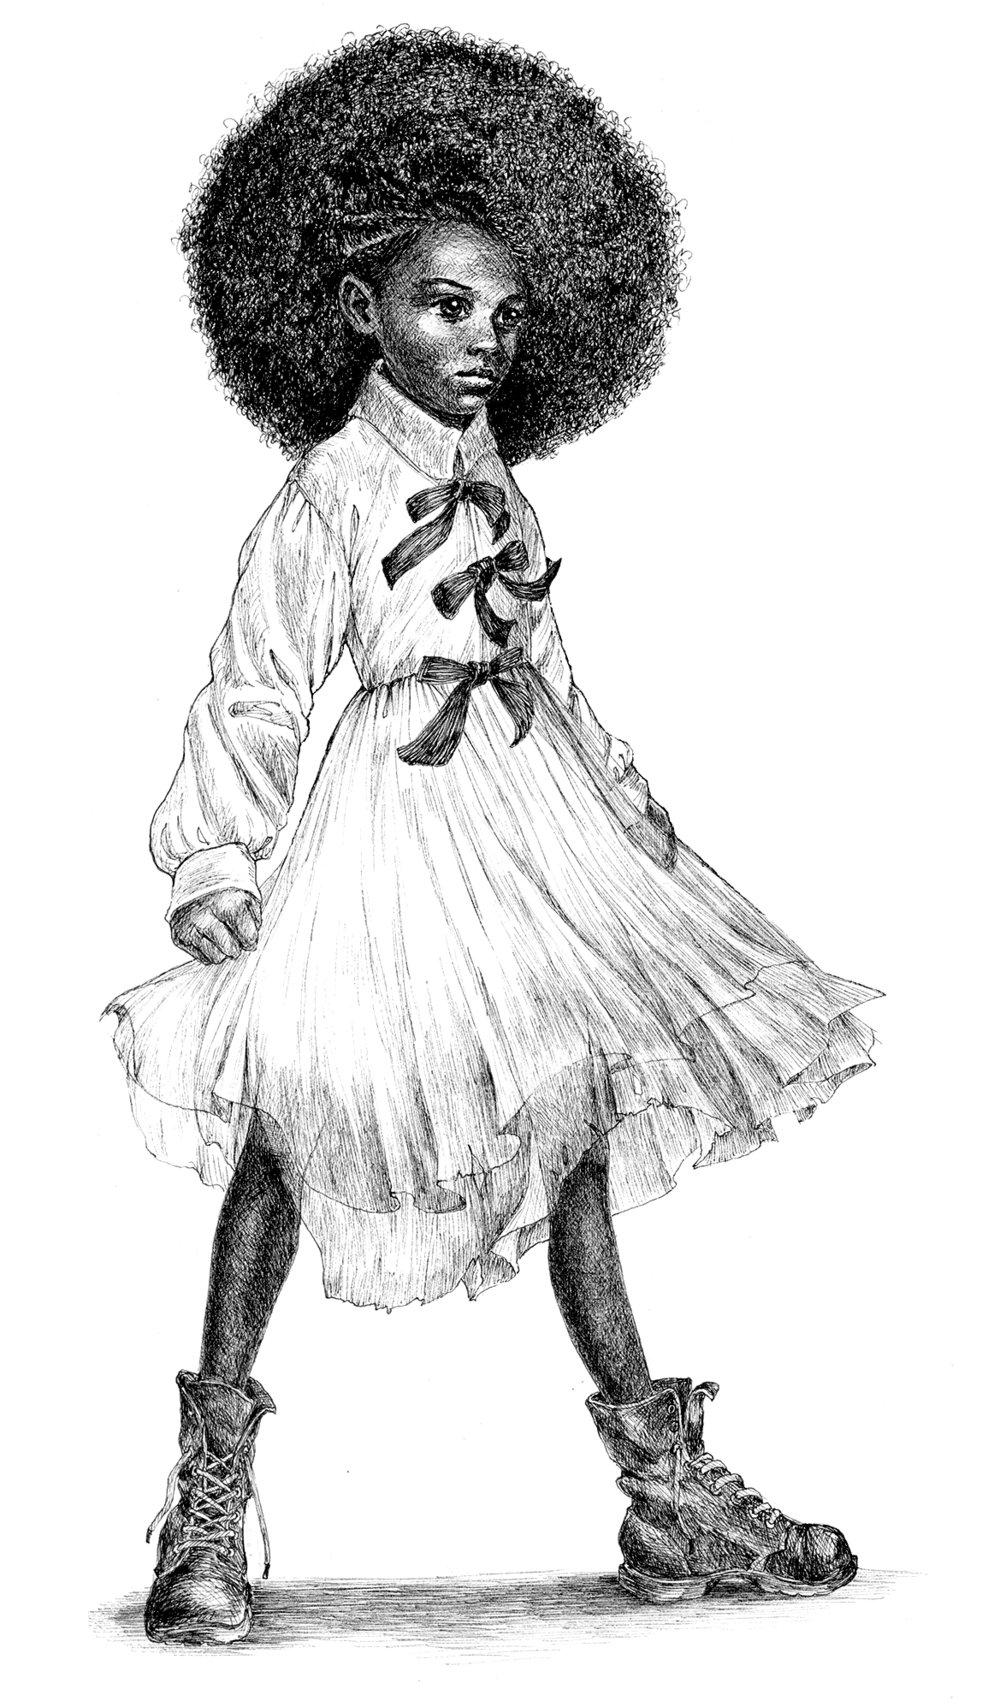 Afro_crop.jpg